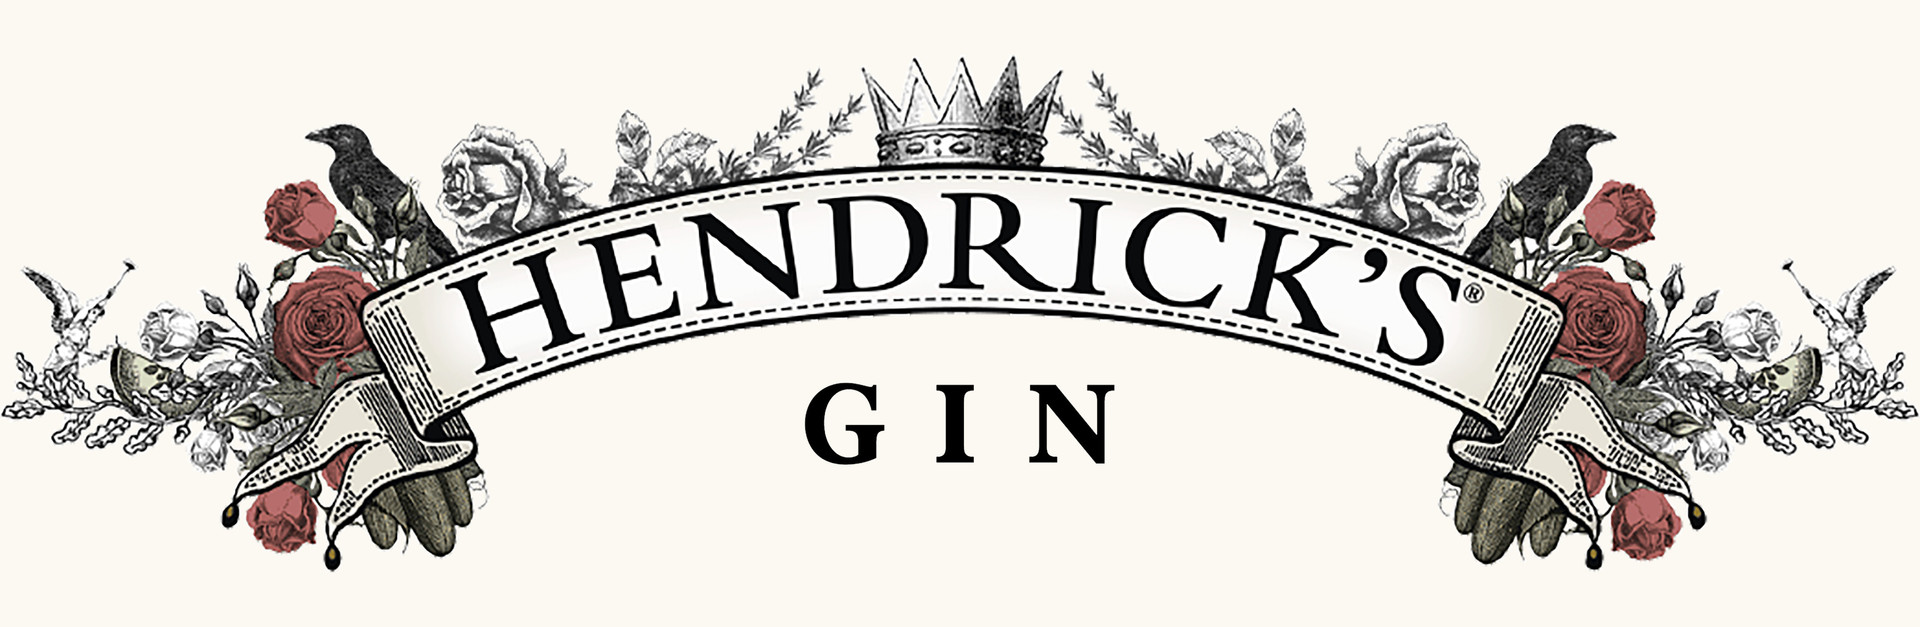 HENDRICK'S GIN X ATELIER MIRU